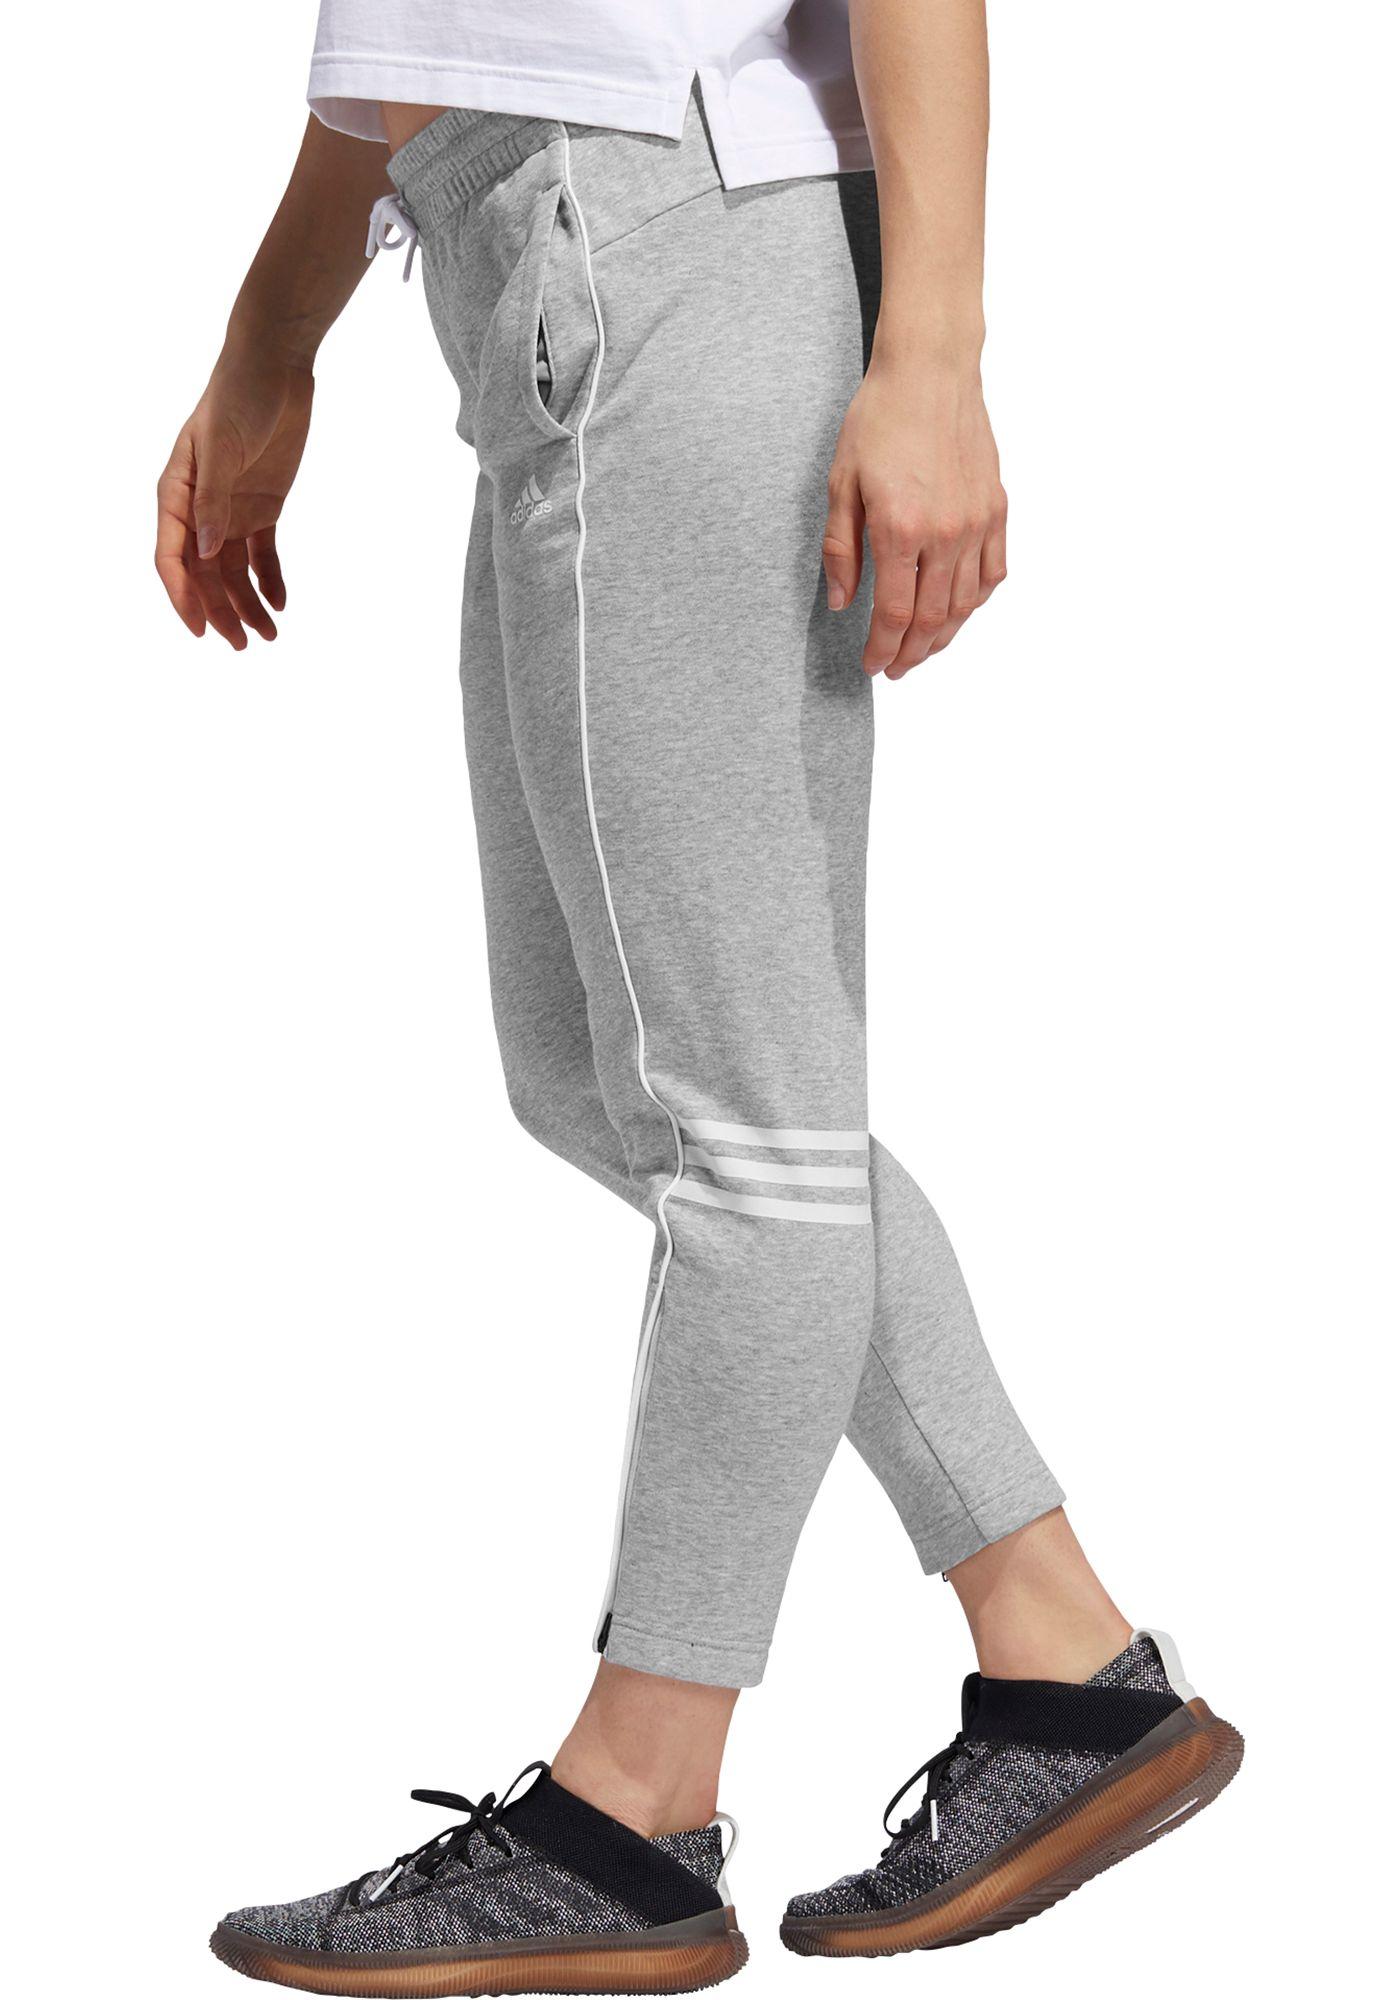 adidas Women's Changeover 7/8 Pants